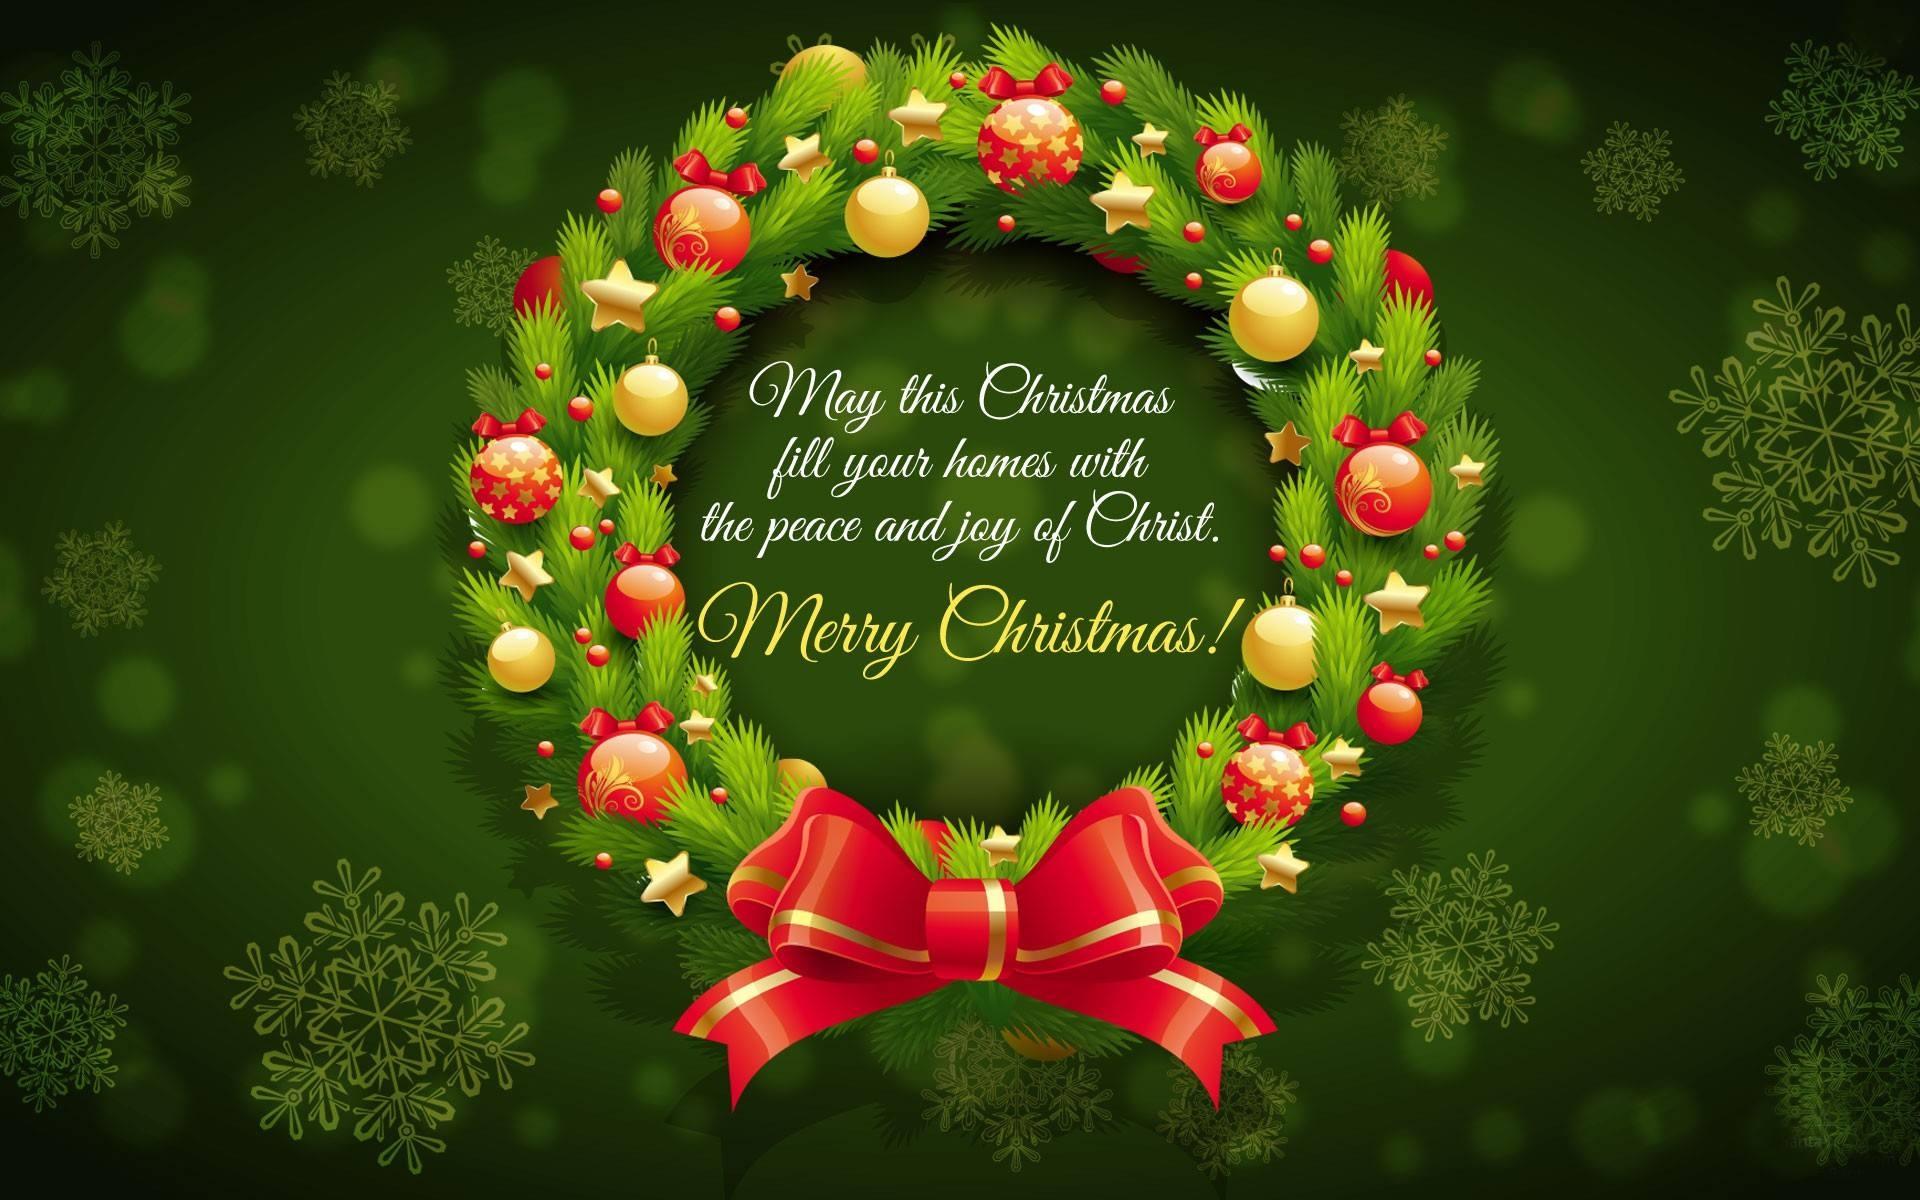 Why Do We Celebrate Christmas.Why Do We Celebrate Christmas Quora